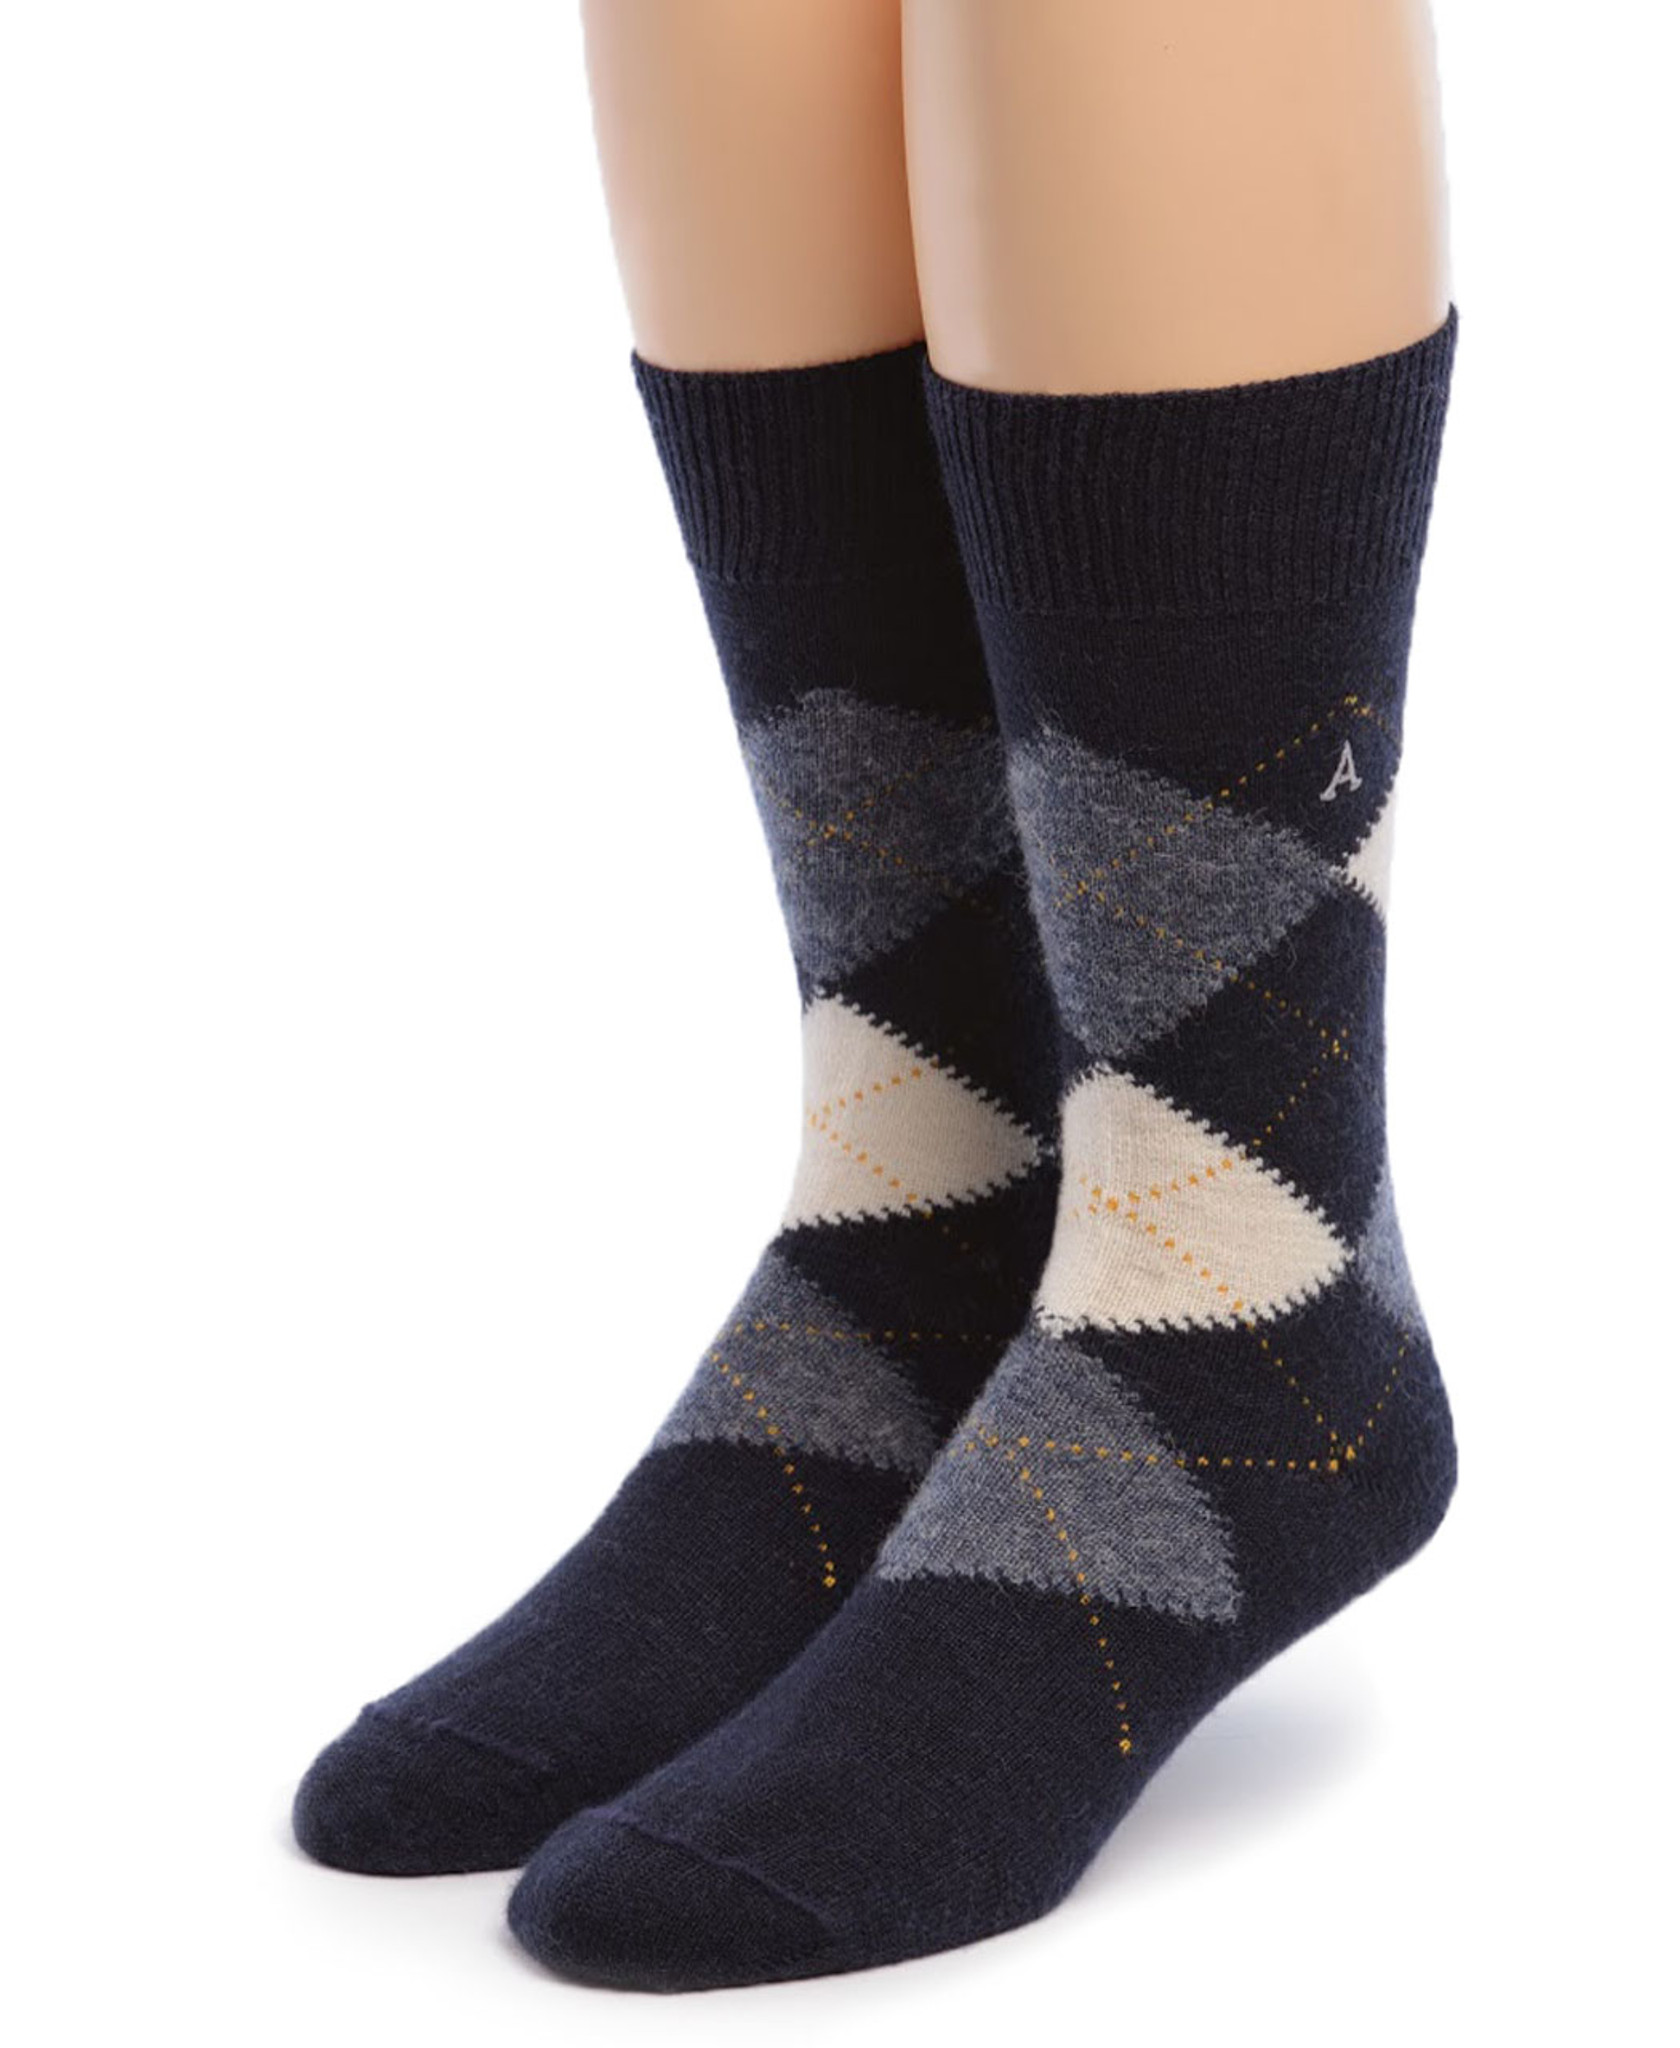 c4ed14f4f6 Argyle Alpaca Socks - Baby Alpaca makes these soft & stylish ...